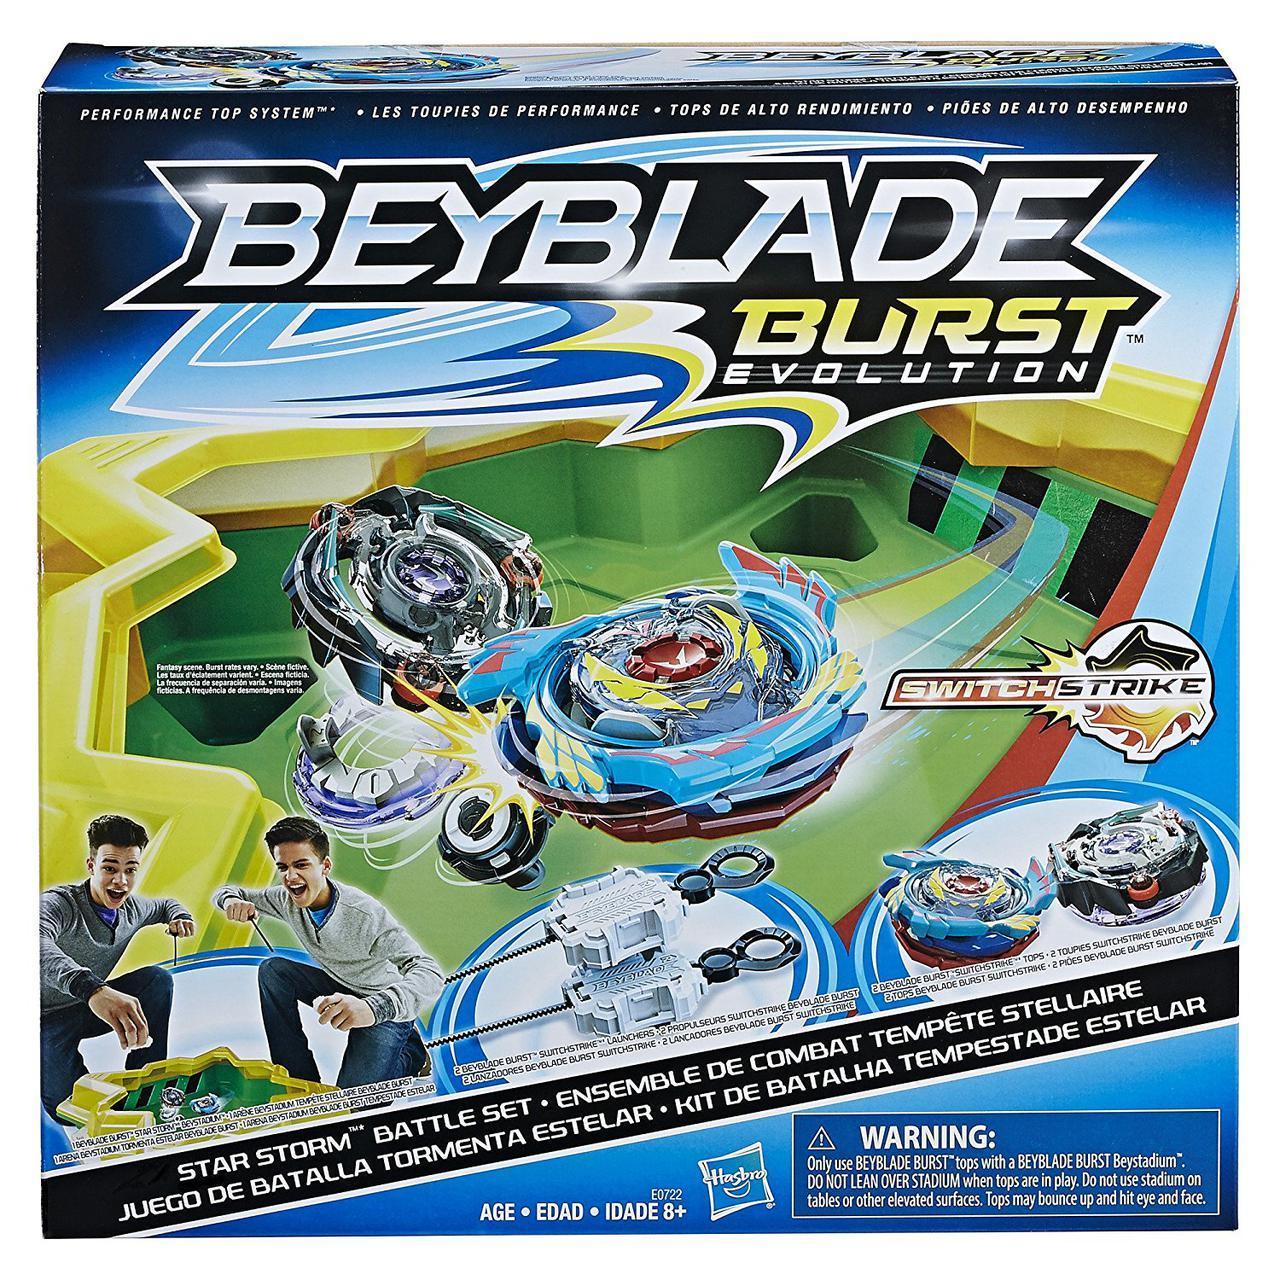 Beyblade Арена и 2 волчка оригинал от Hasbro Burst Evolution Sta 3